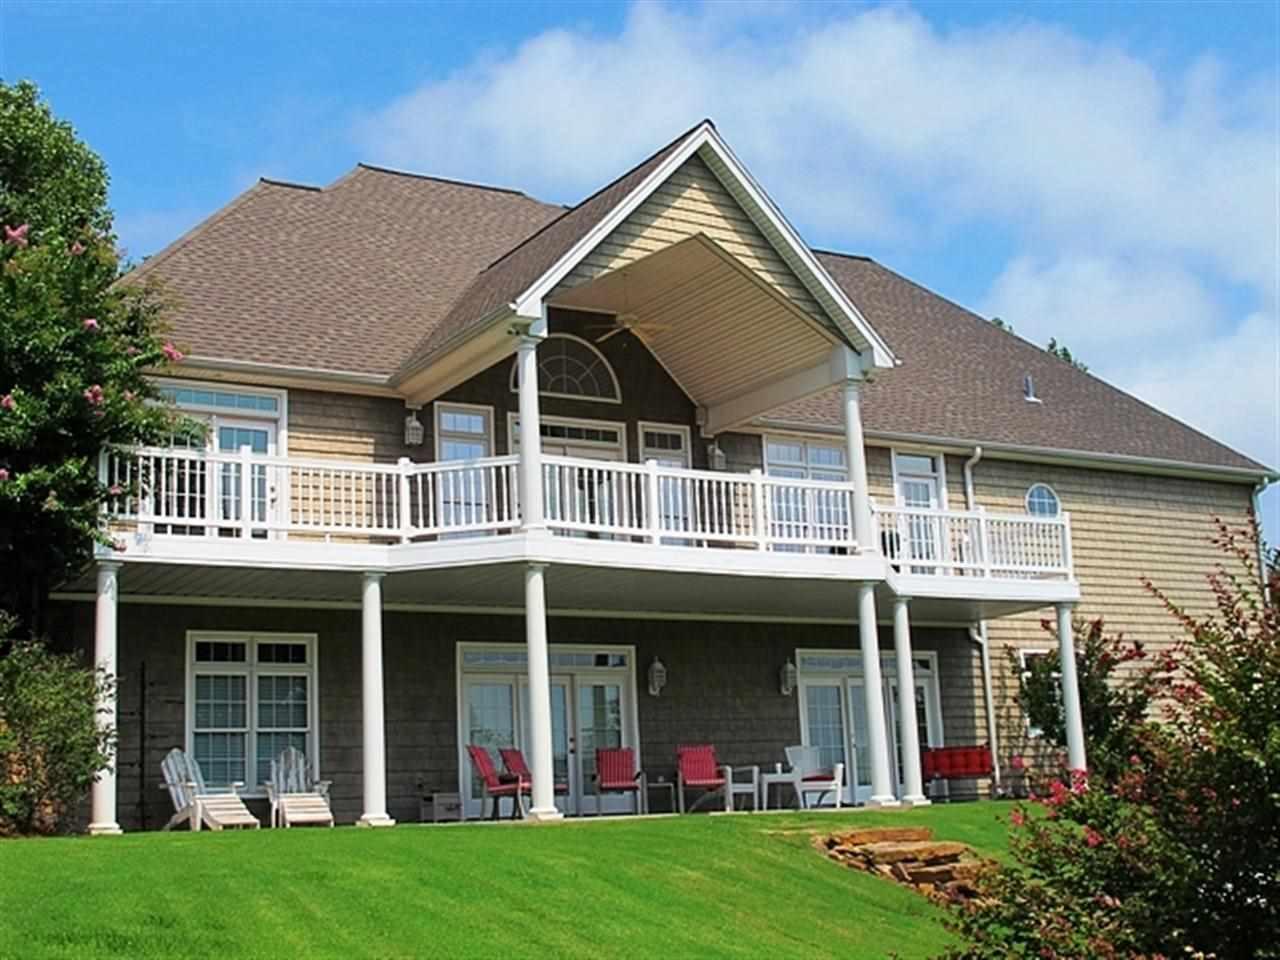 Real Estate for Sale, ListingId: 25527511, Eddyville,KY42038